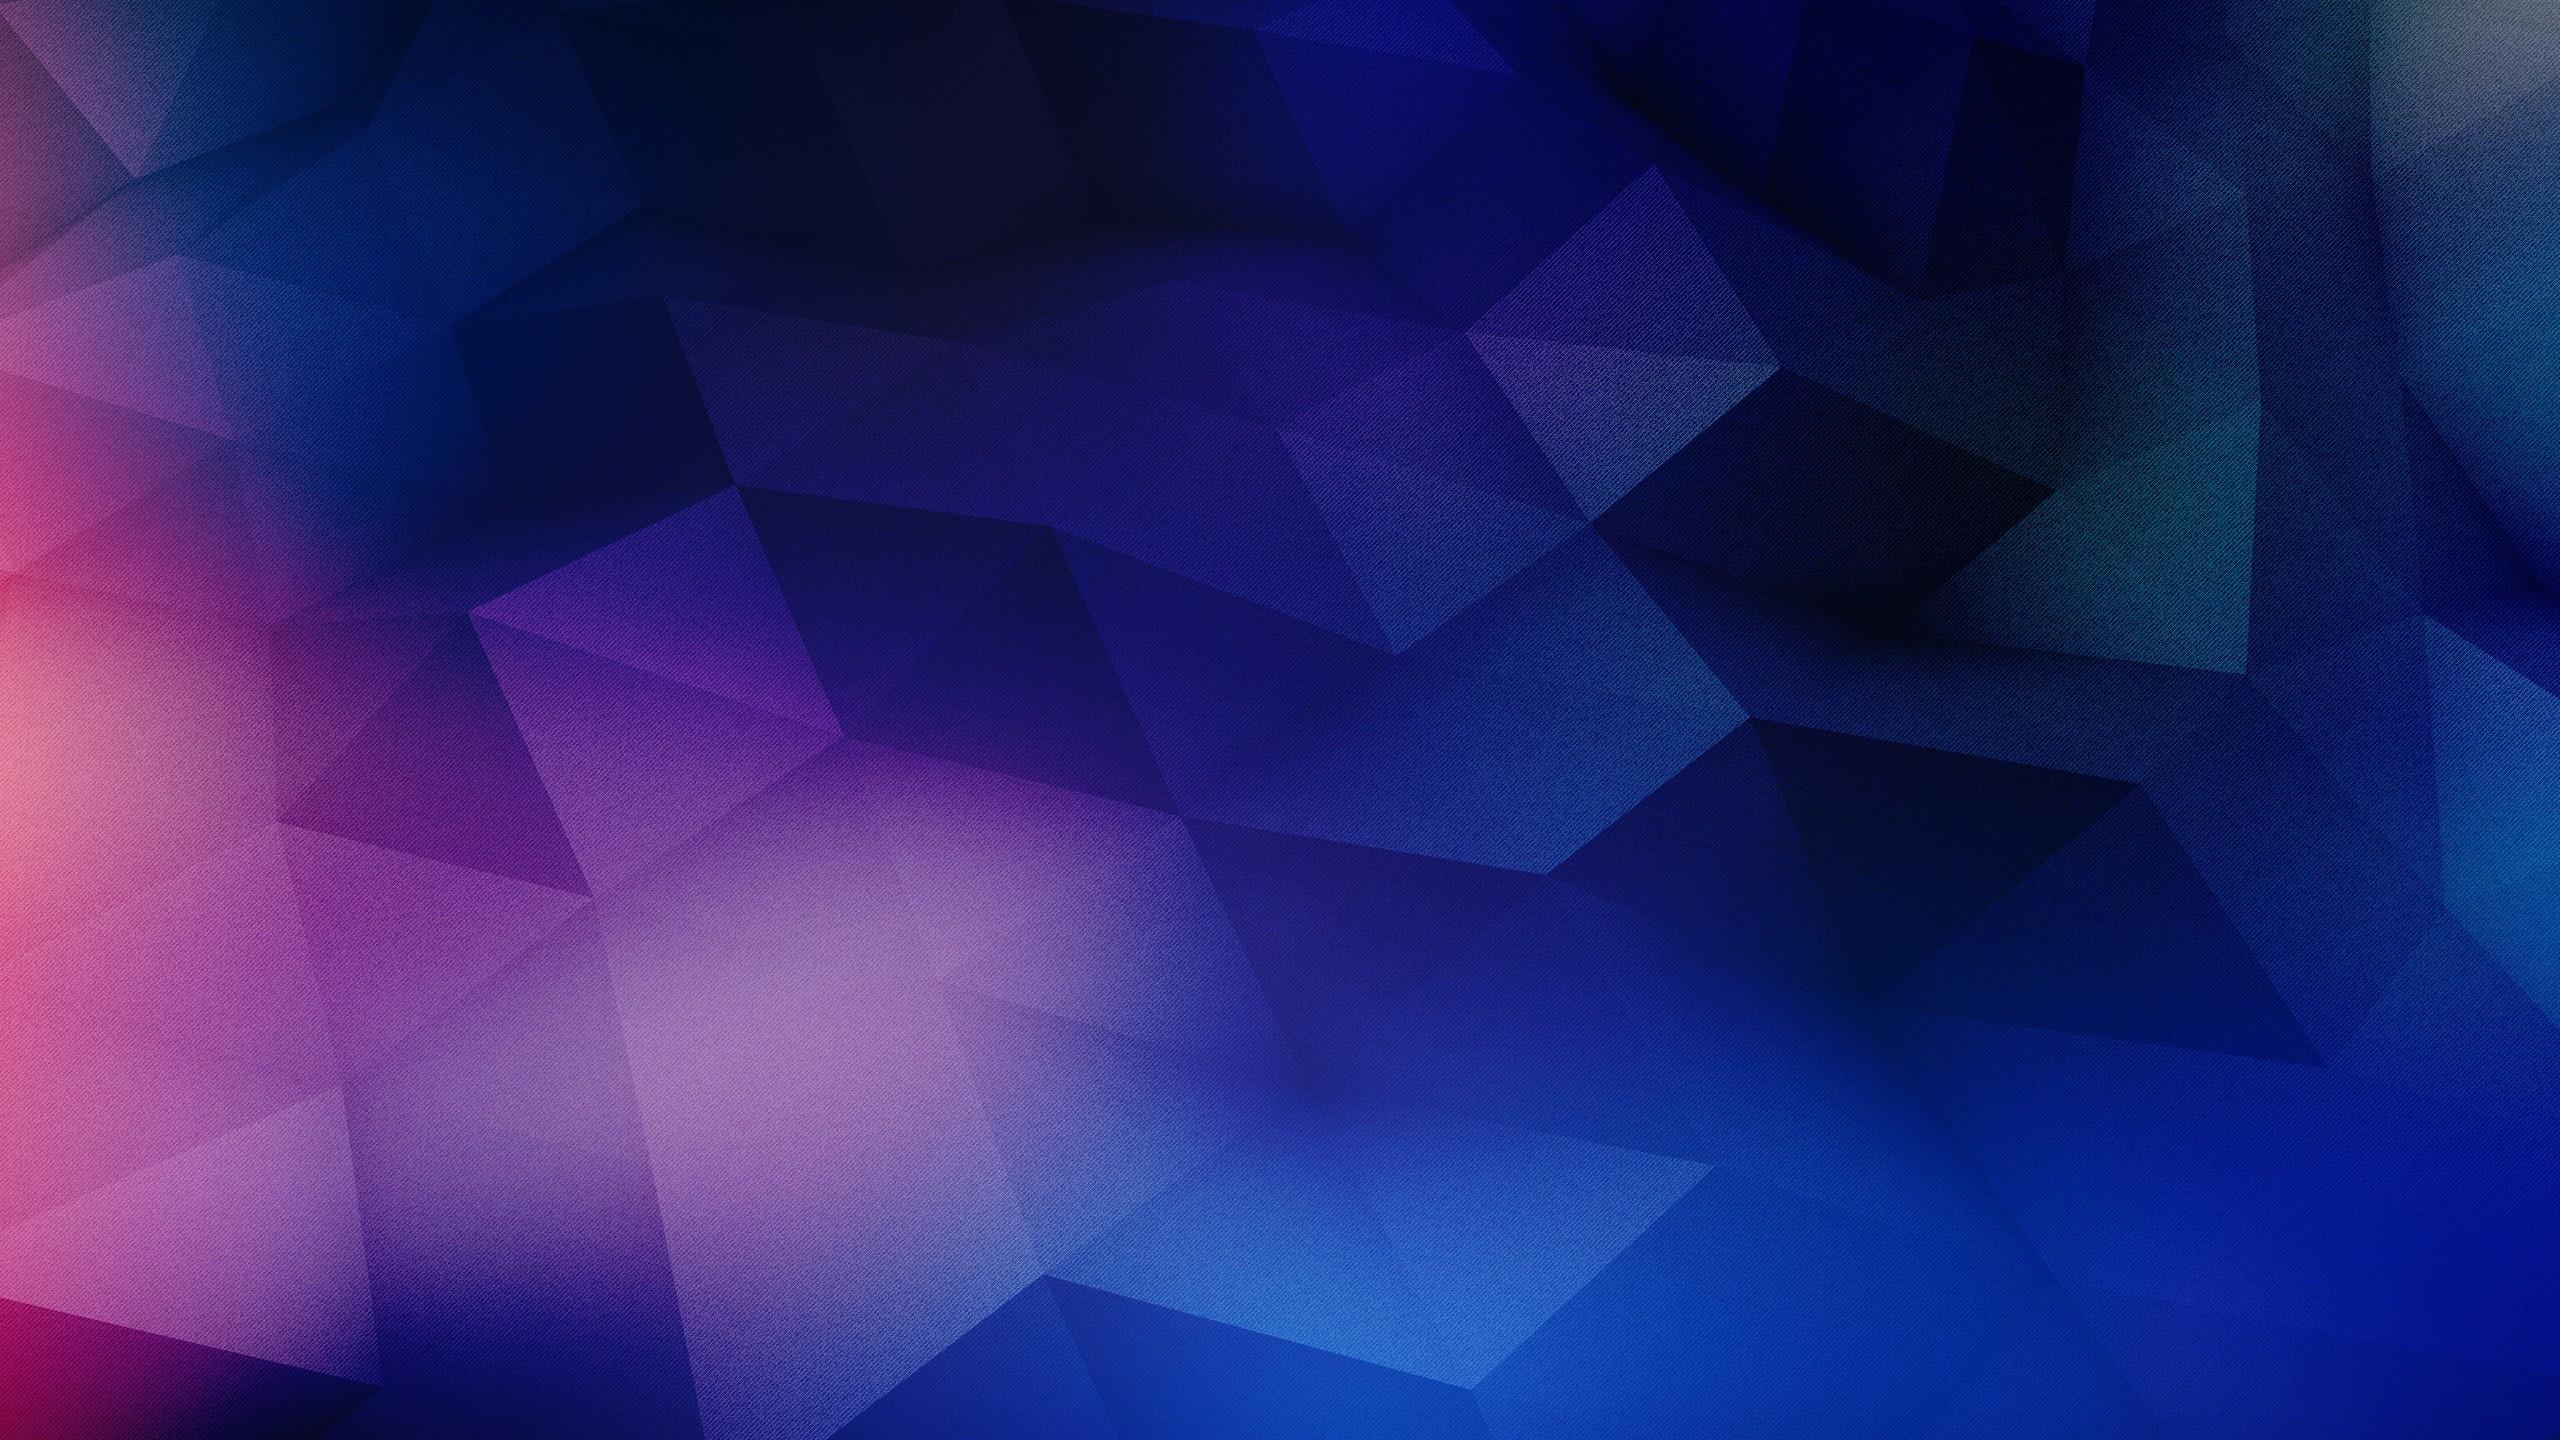 Blue & Purple Geometric Shapes